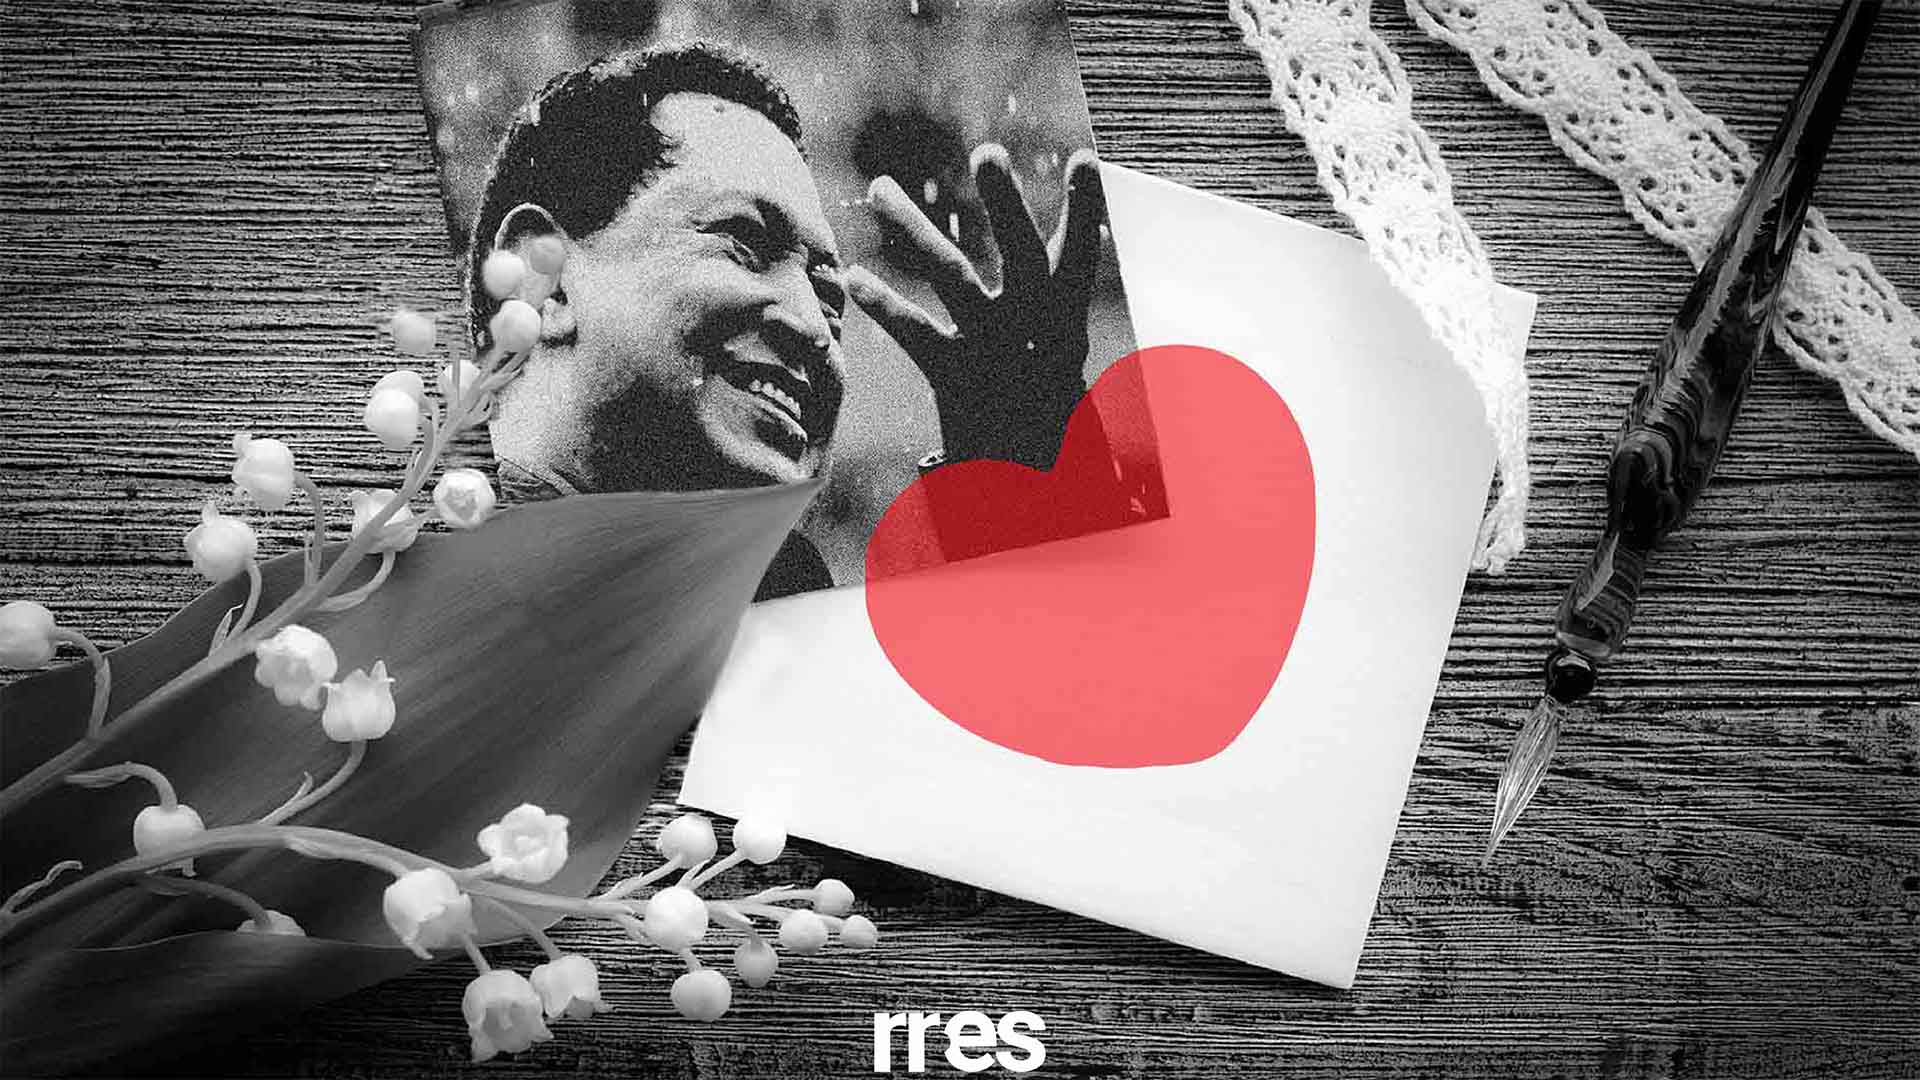 Cartas de amor, por Laureano Márquez P.